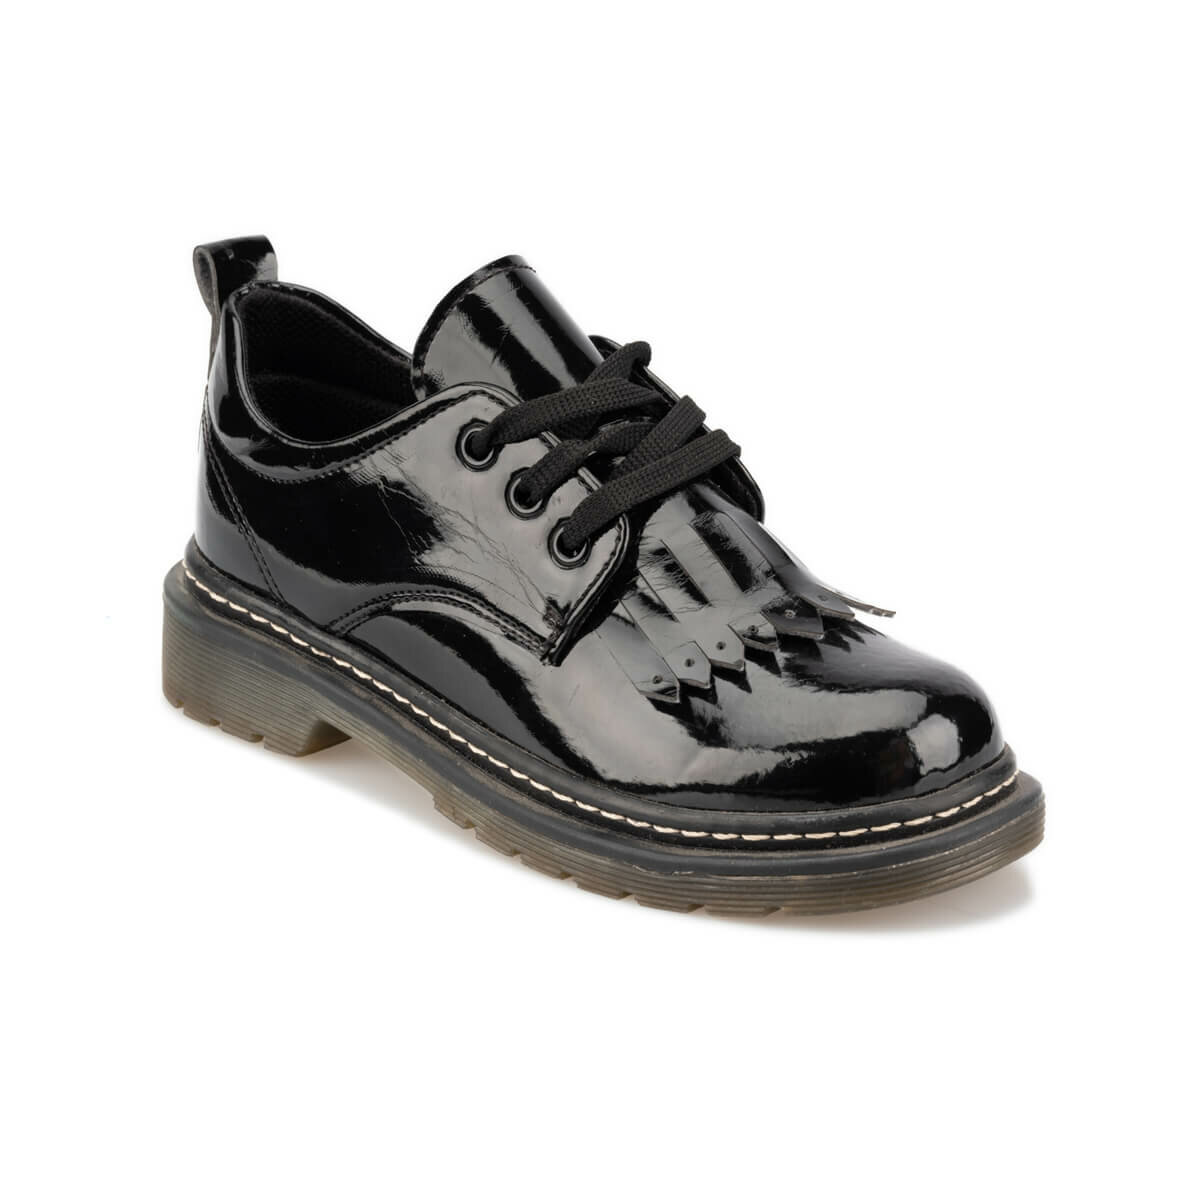 FLO 92.511903.F Black Female Child Shoes Polaris